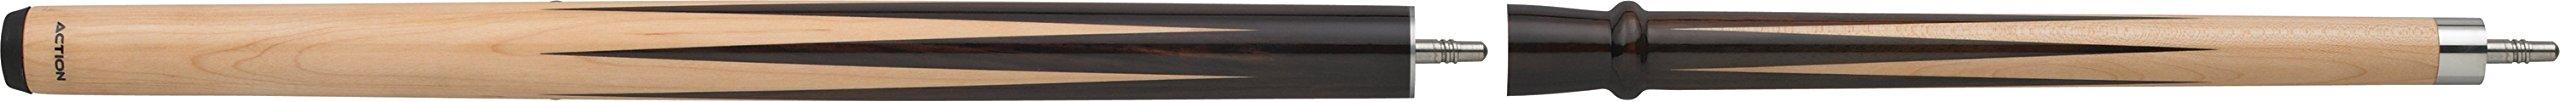 Birdseye Maple with Darker Stained Maple Splices Break Jump Cue